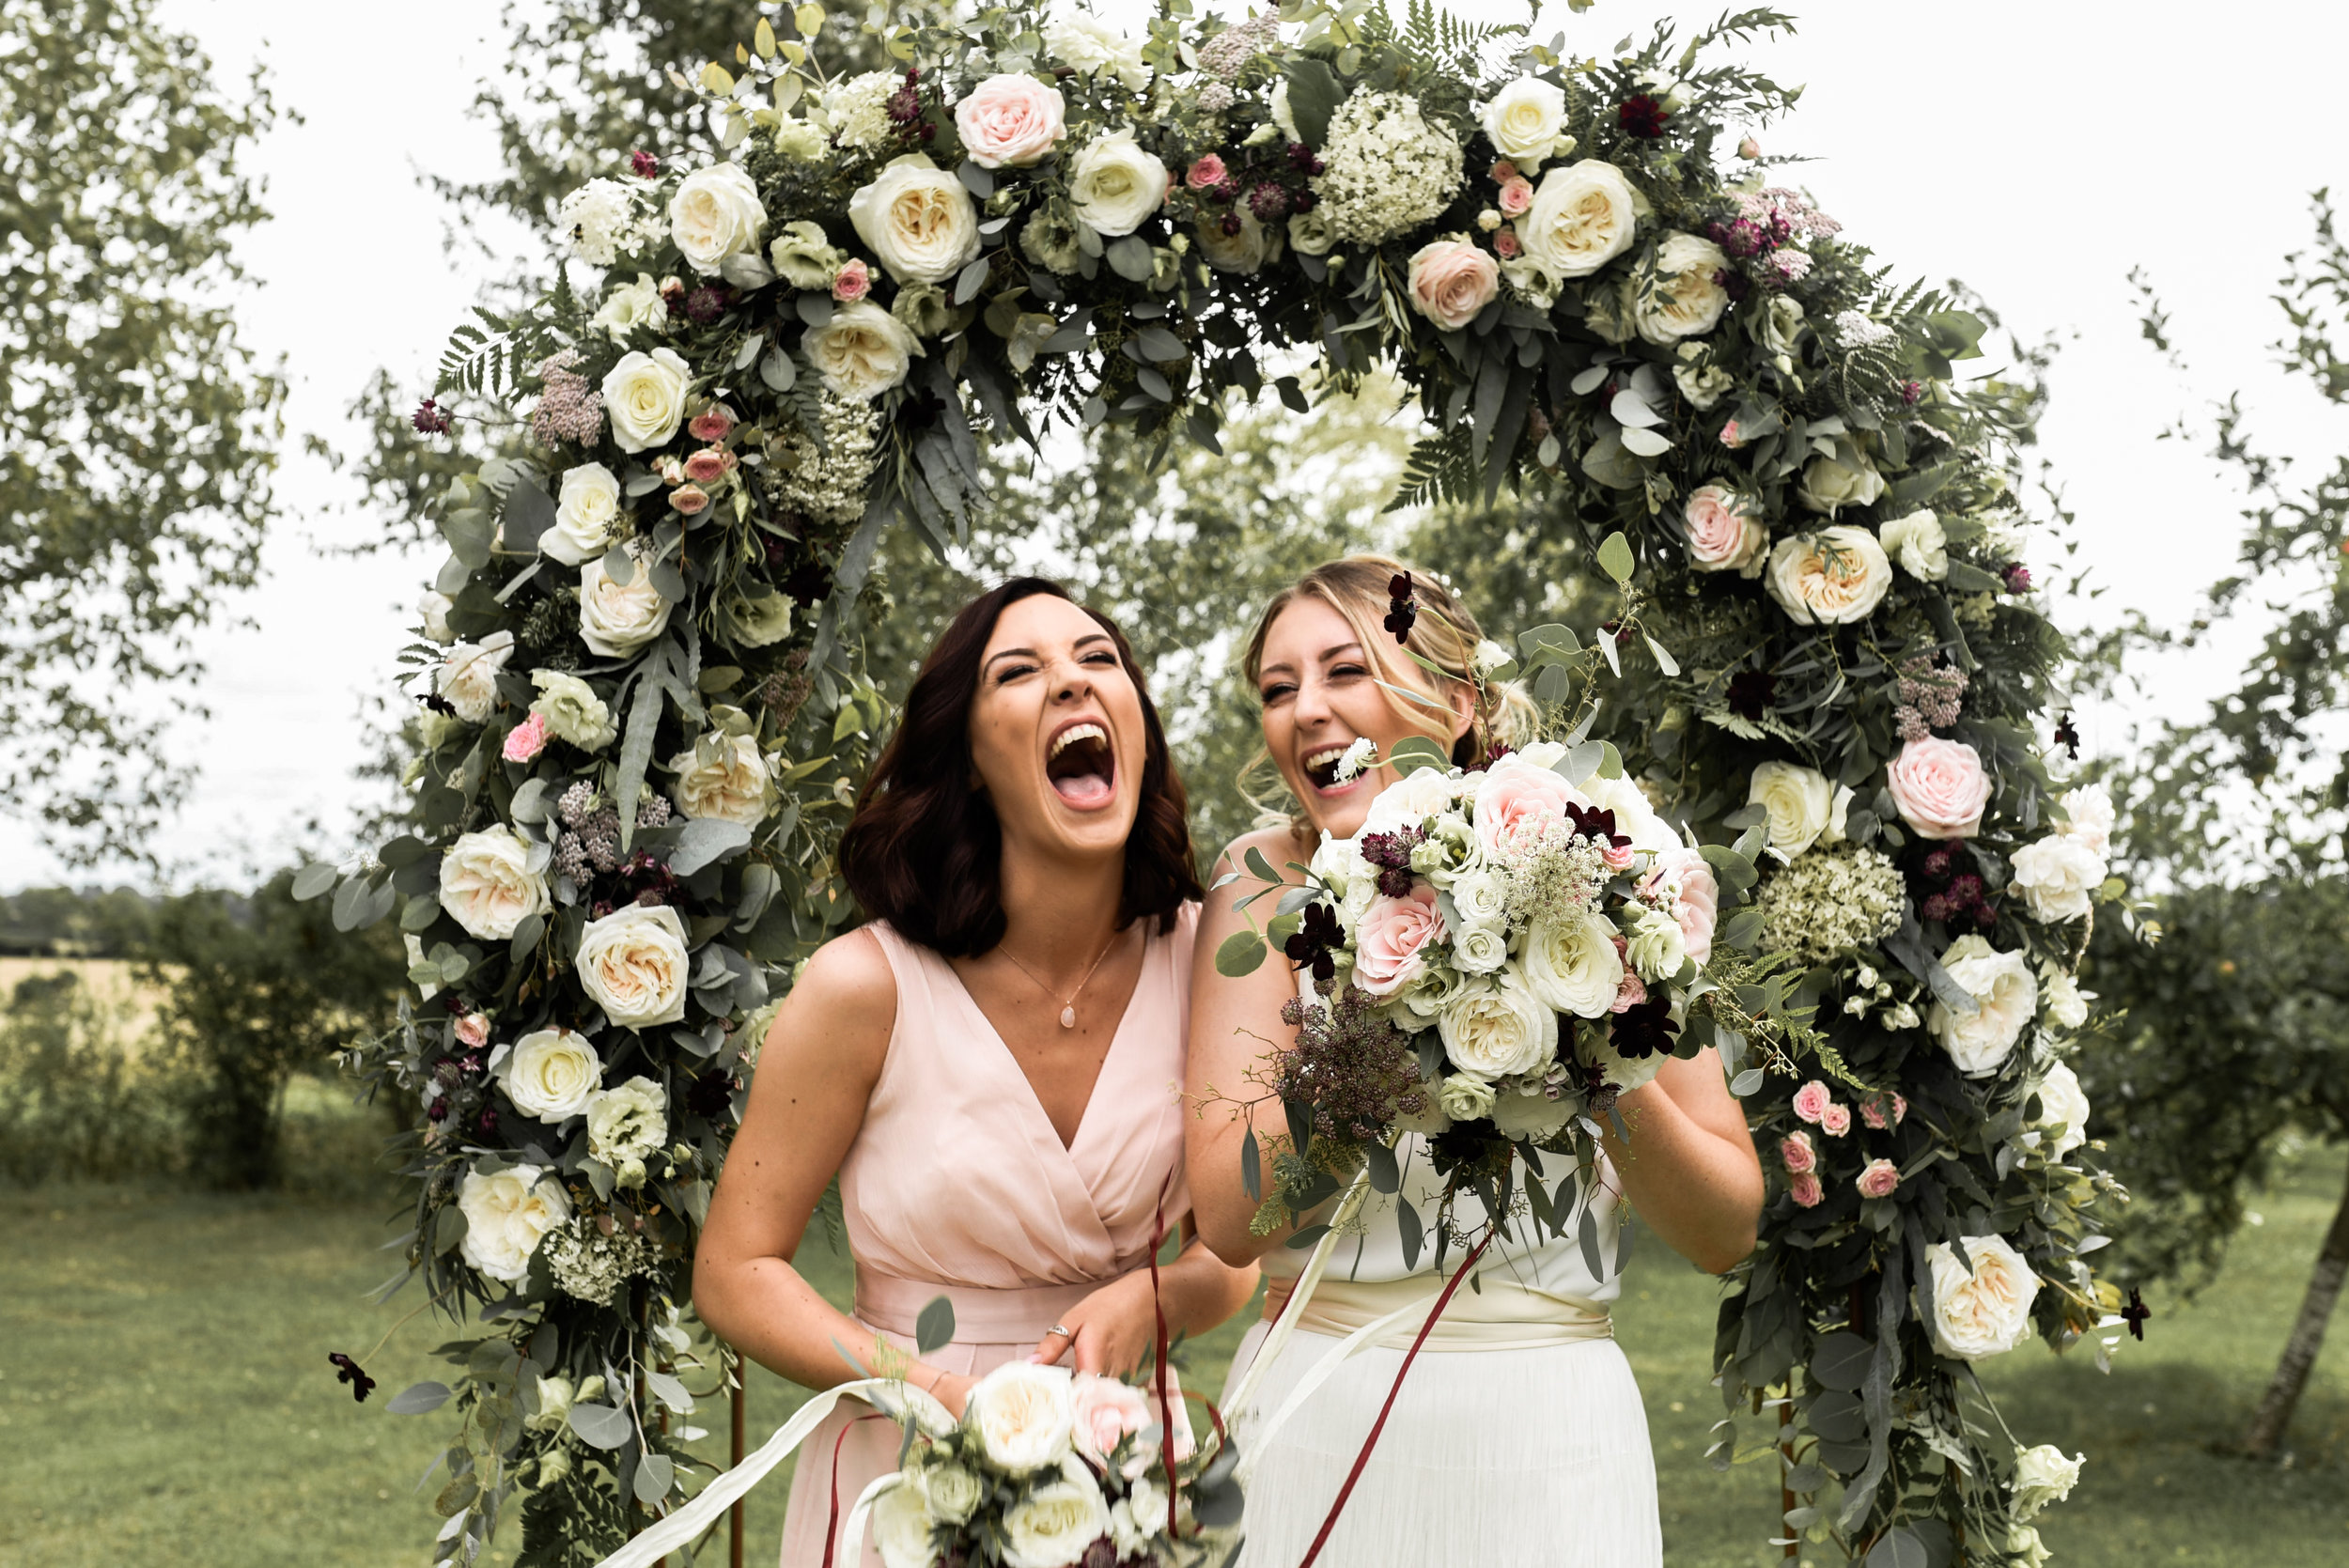 tara-florence-wedding-photography-london.jpg